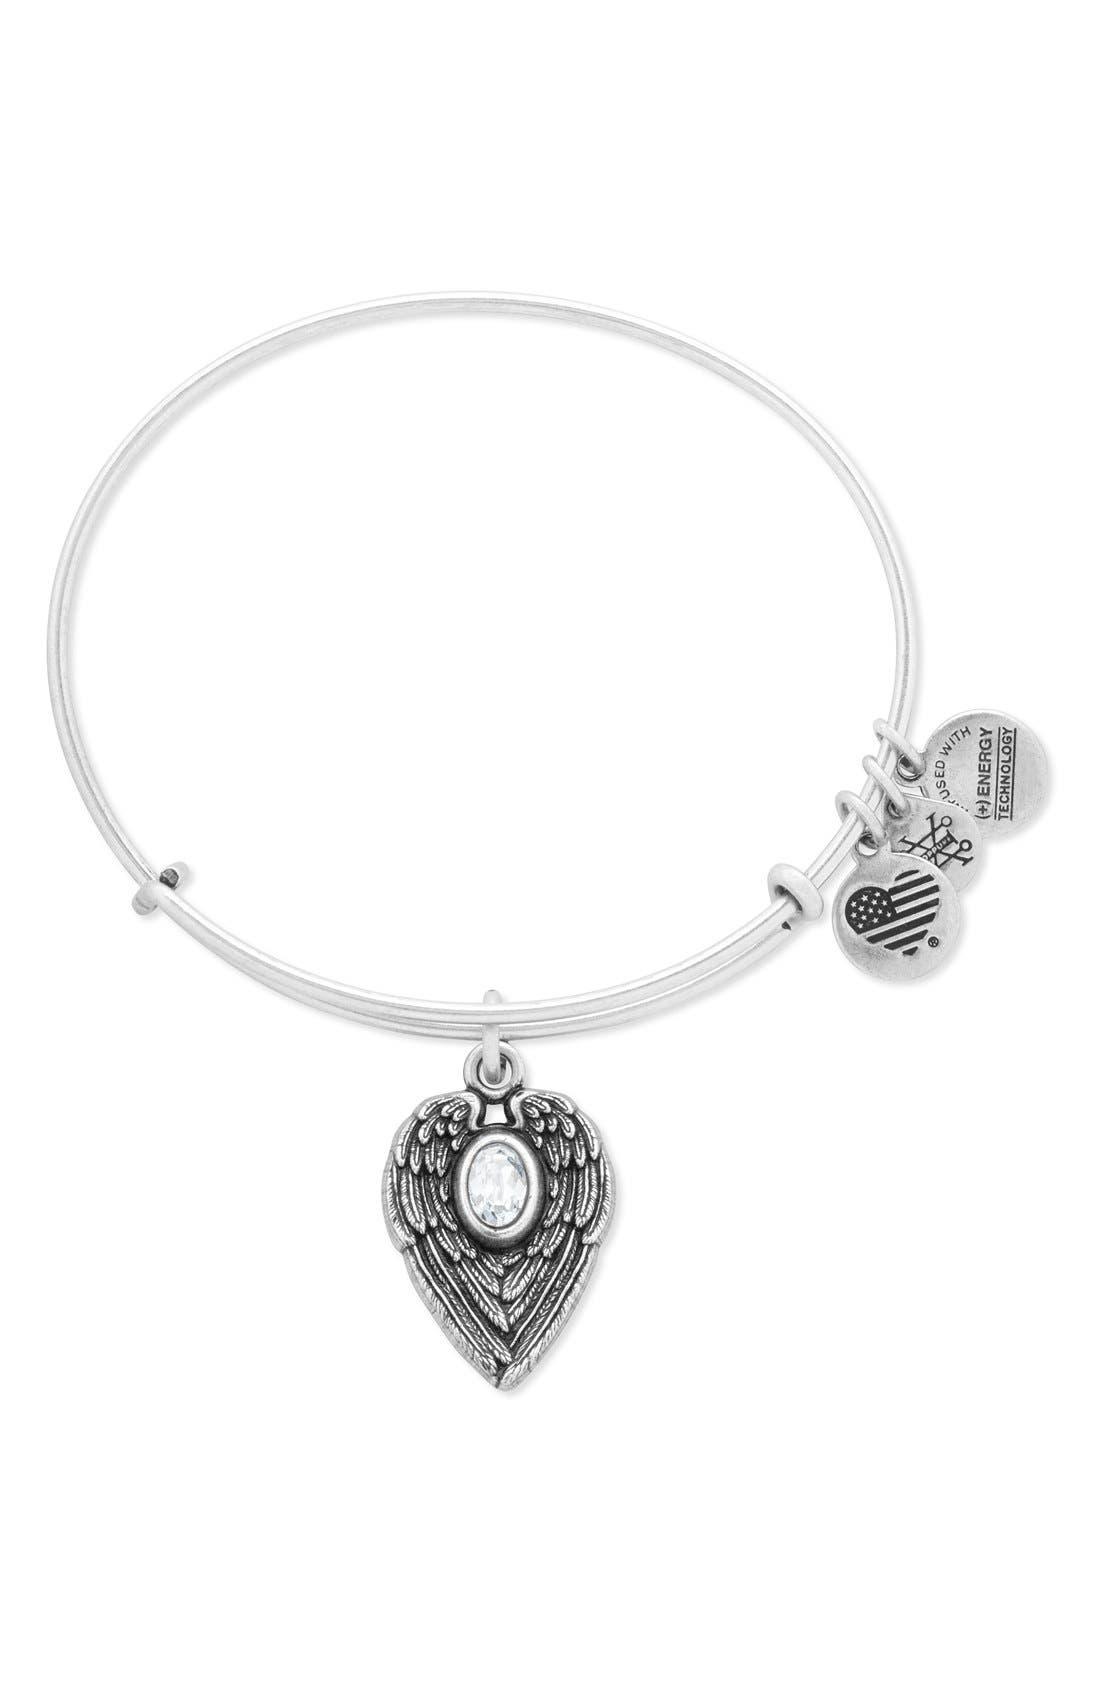 alex and ani jewelry